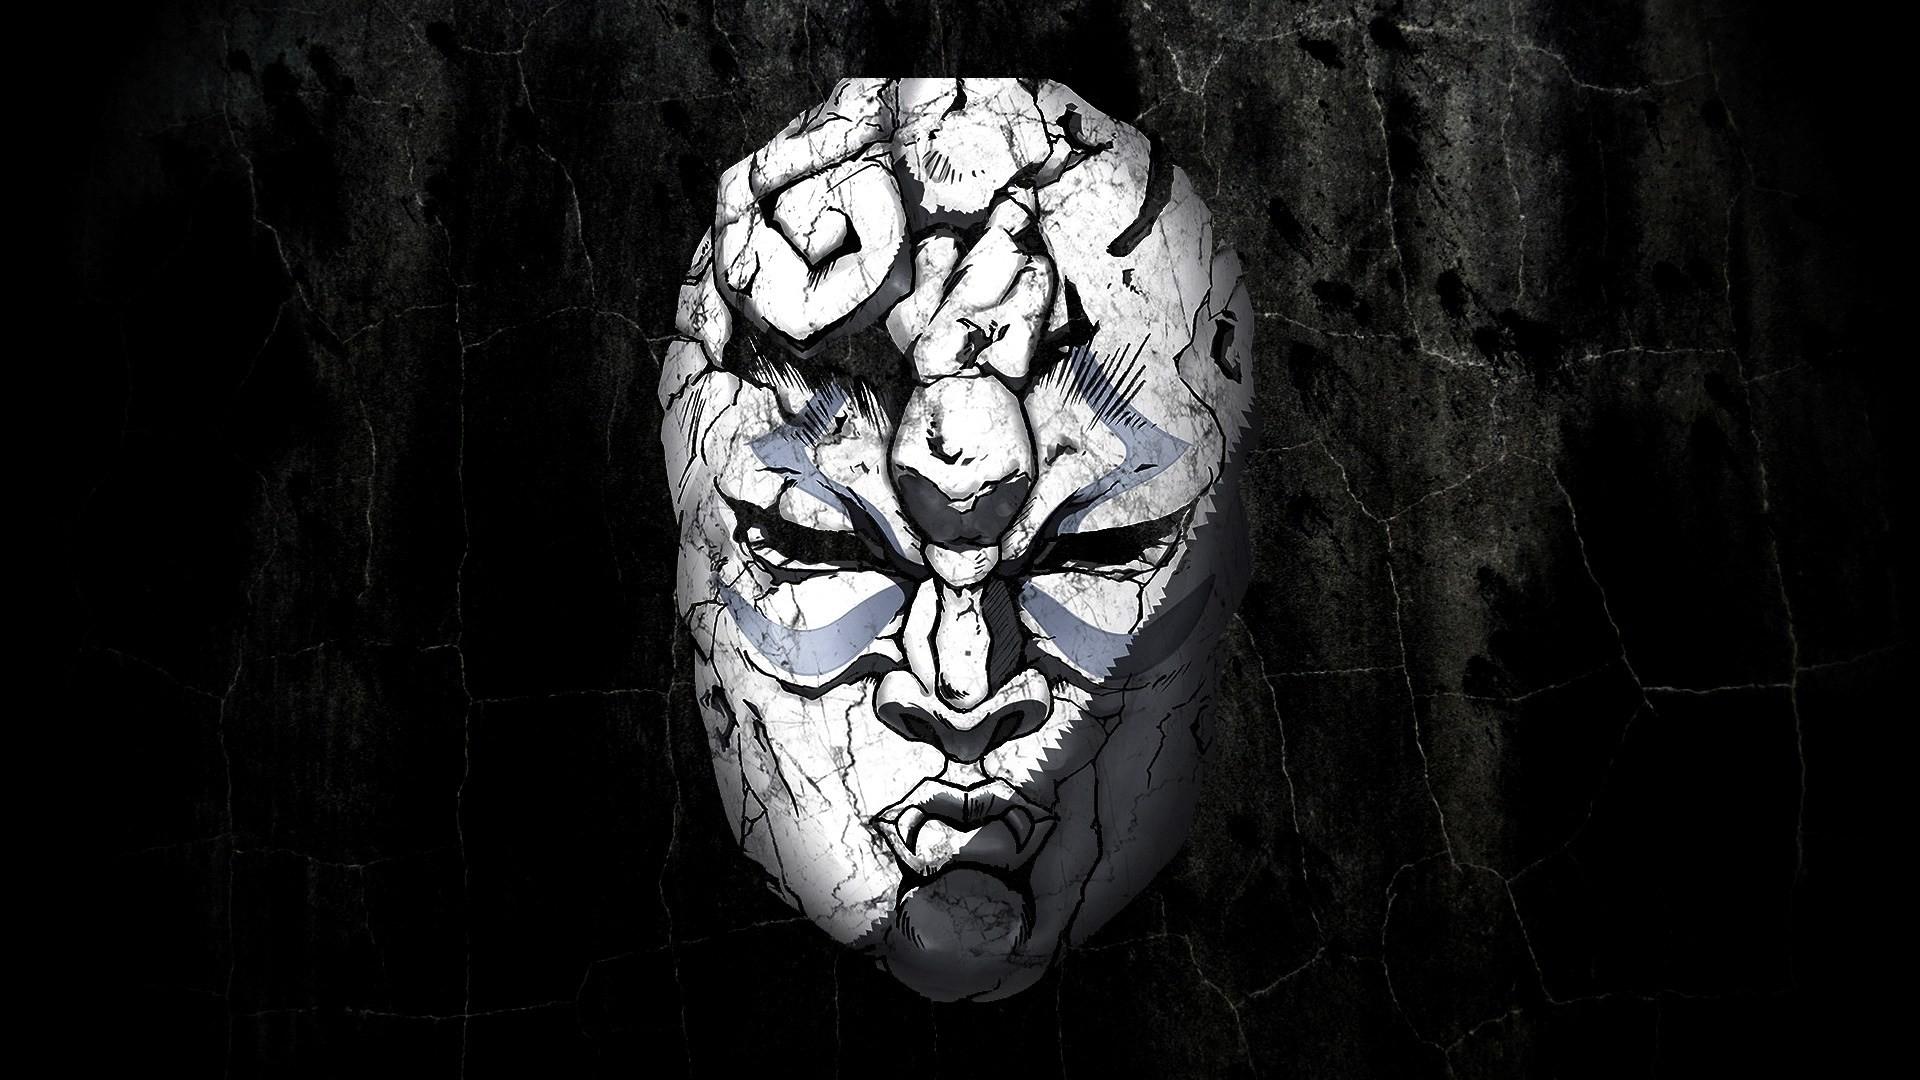 Res: 1920x1080, Mask JoJo's Bizarre Adventure 1080p HD Wallpaper Background